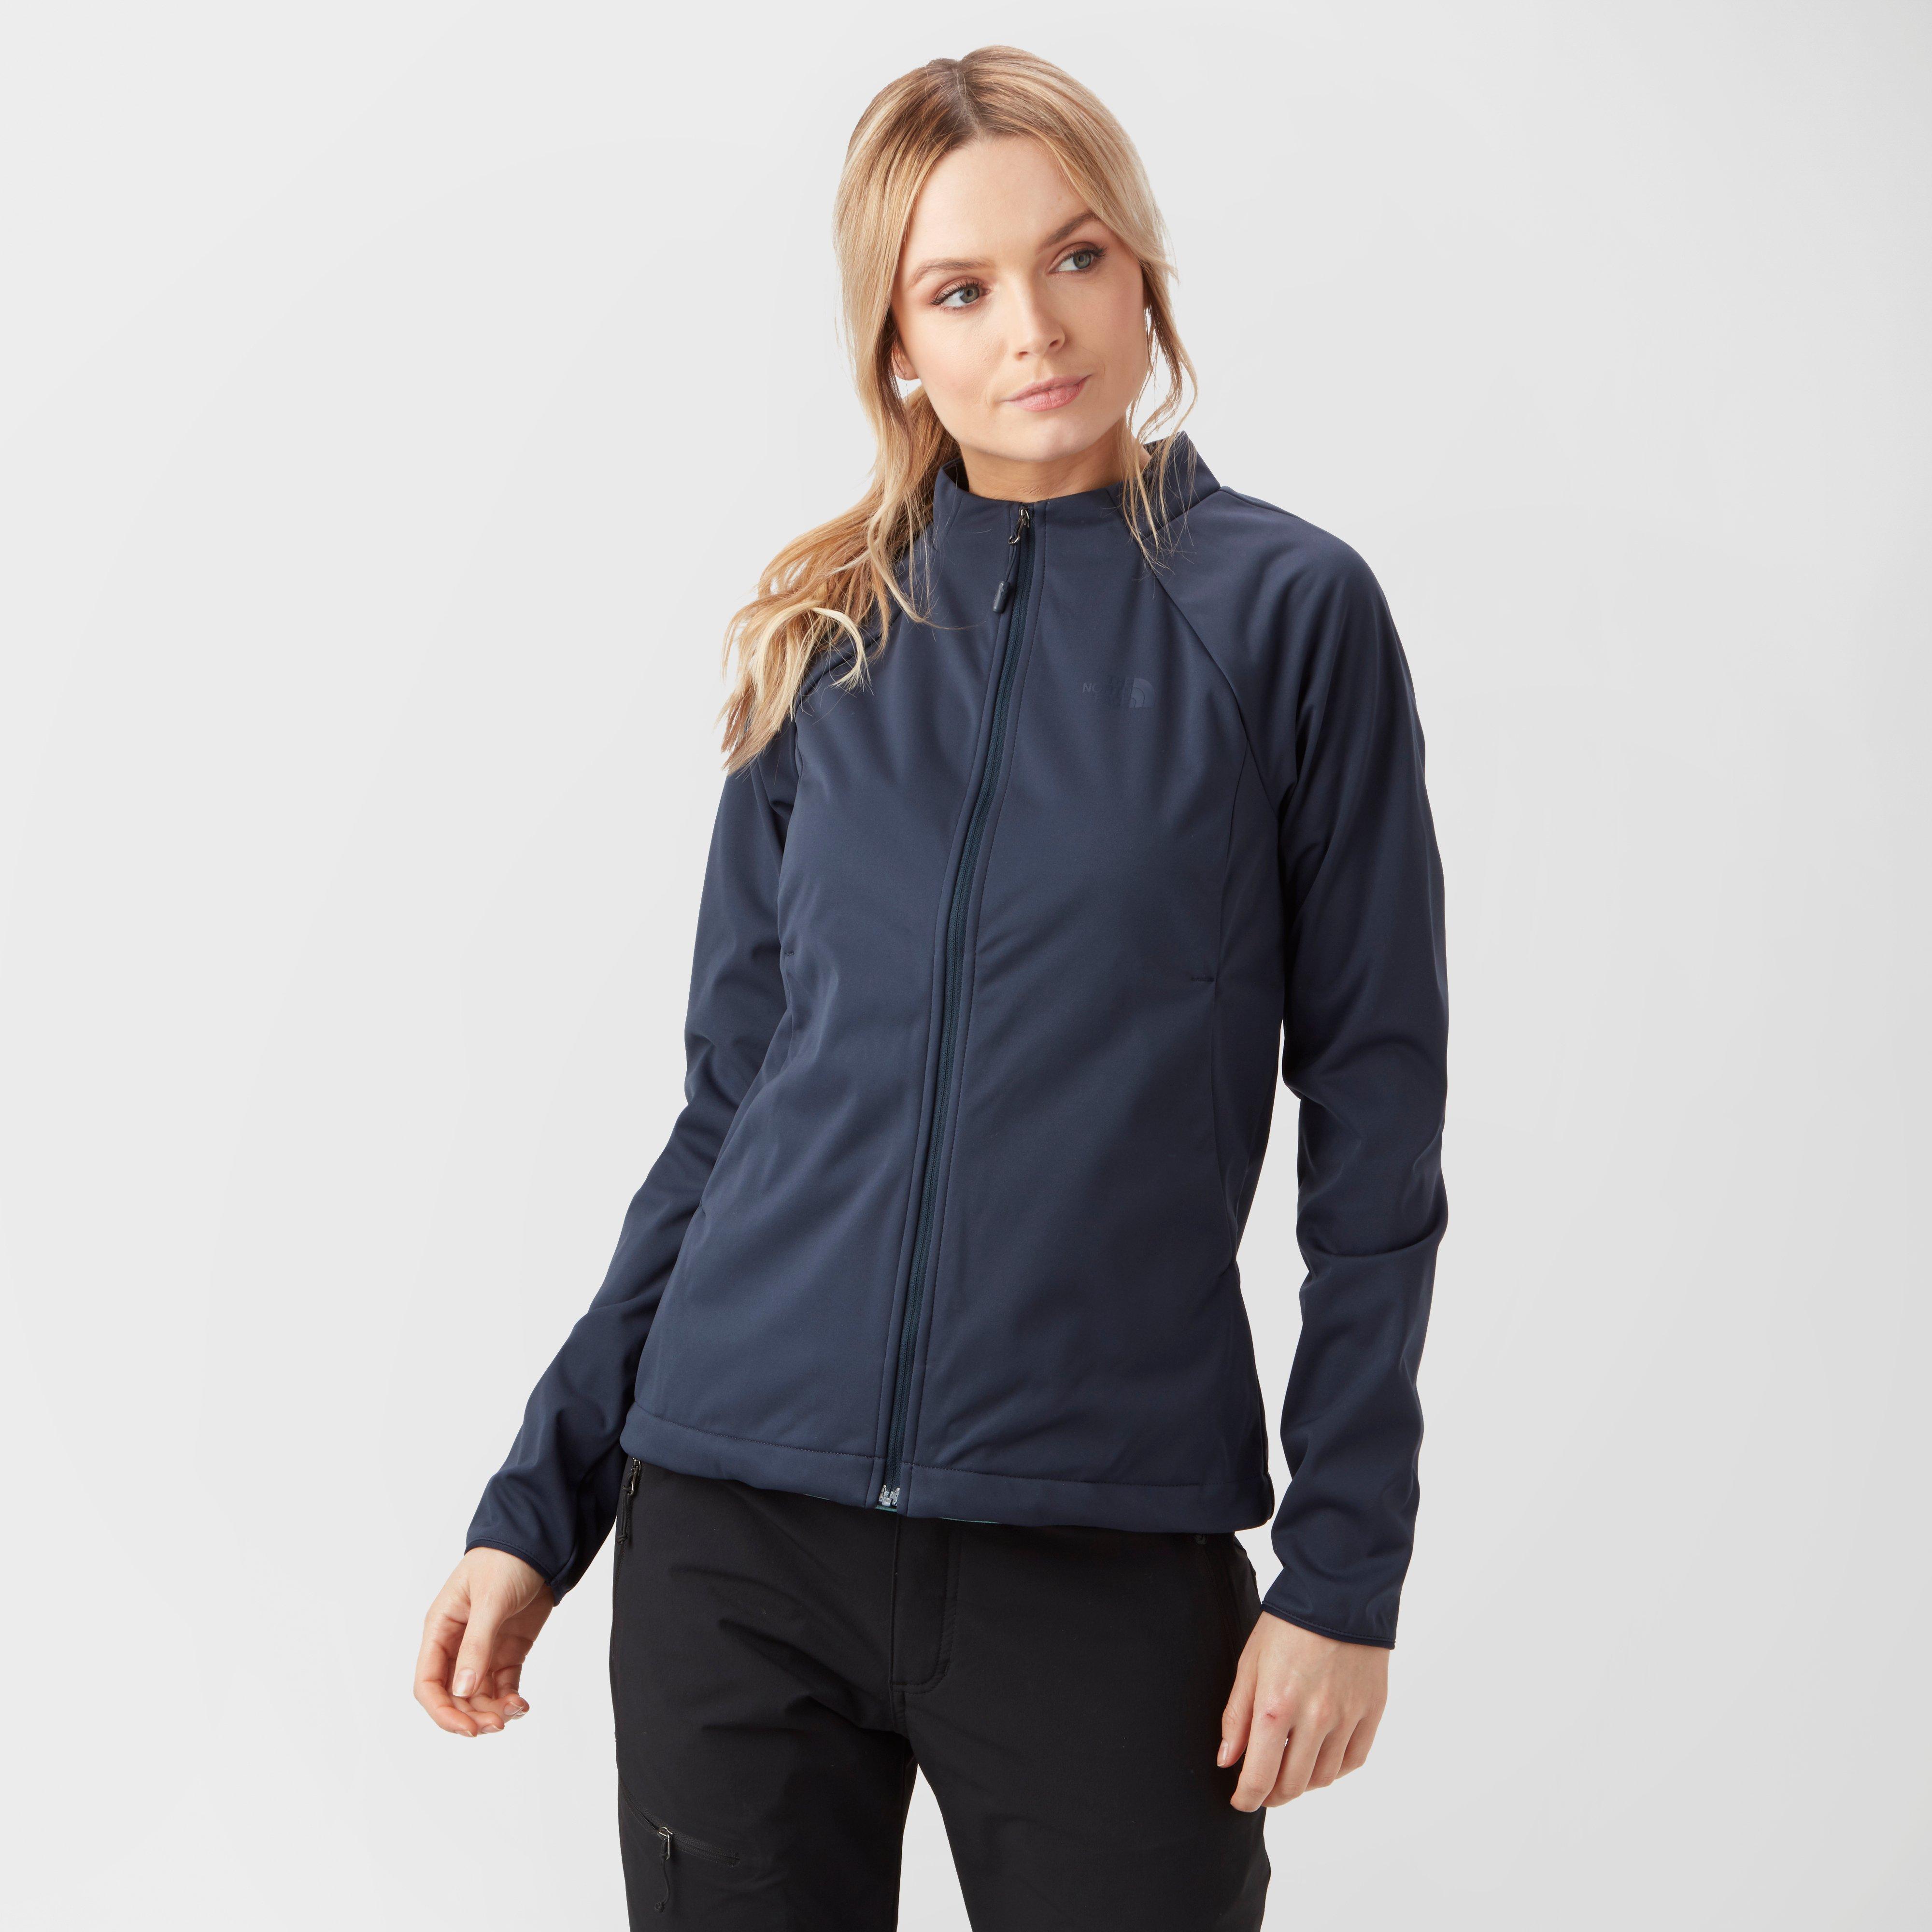 7320fc5ca Women's Inlux Softshell Jacket